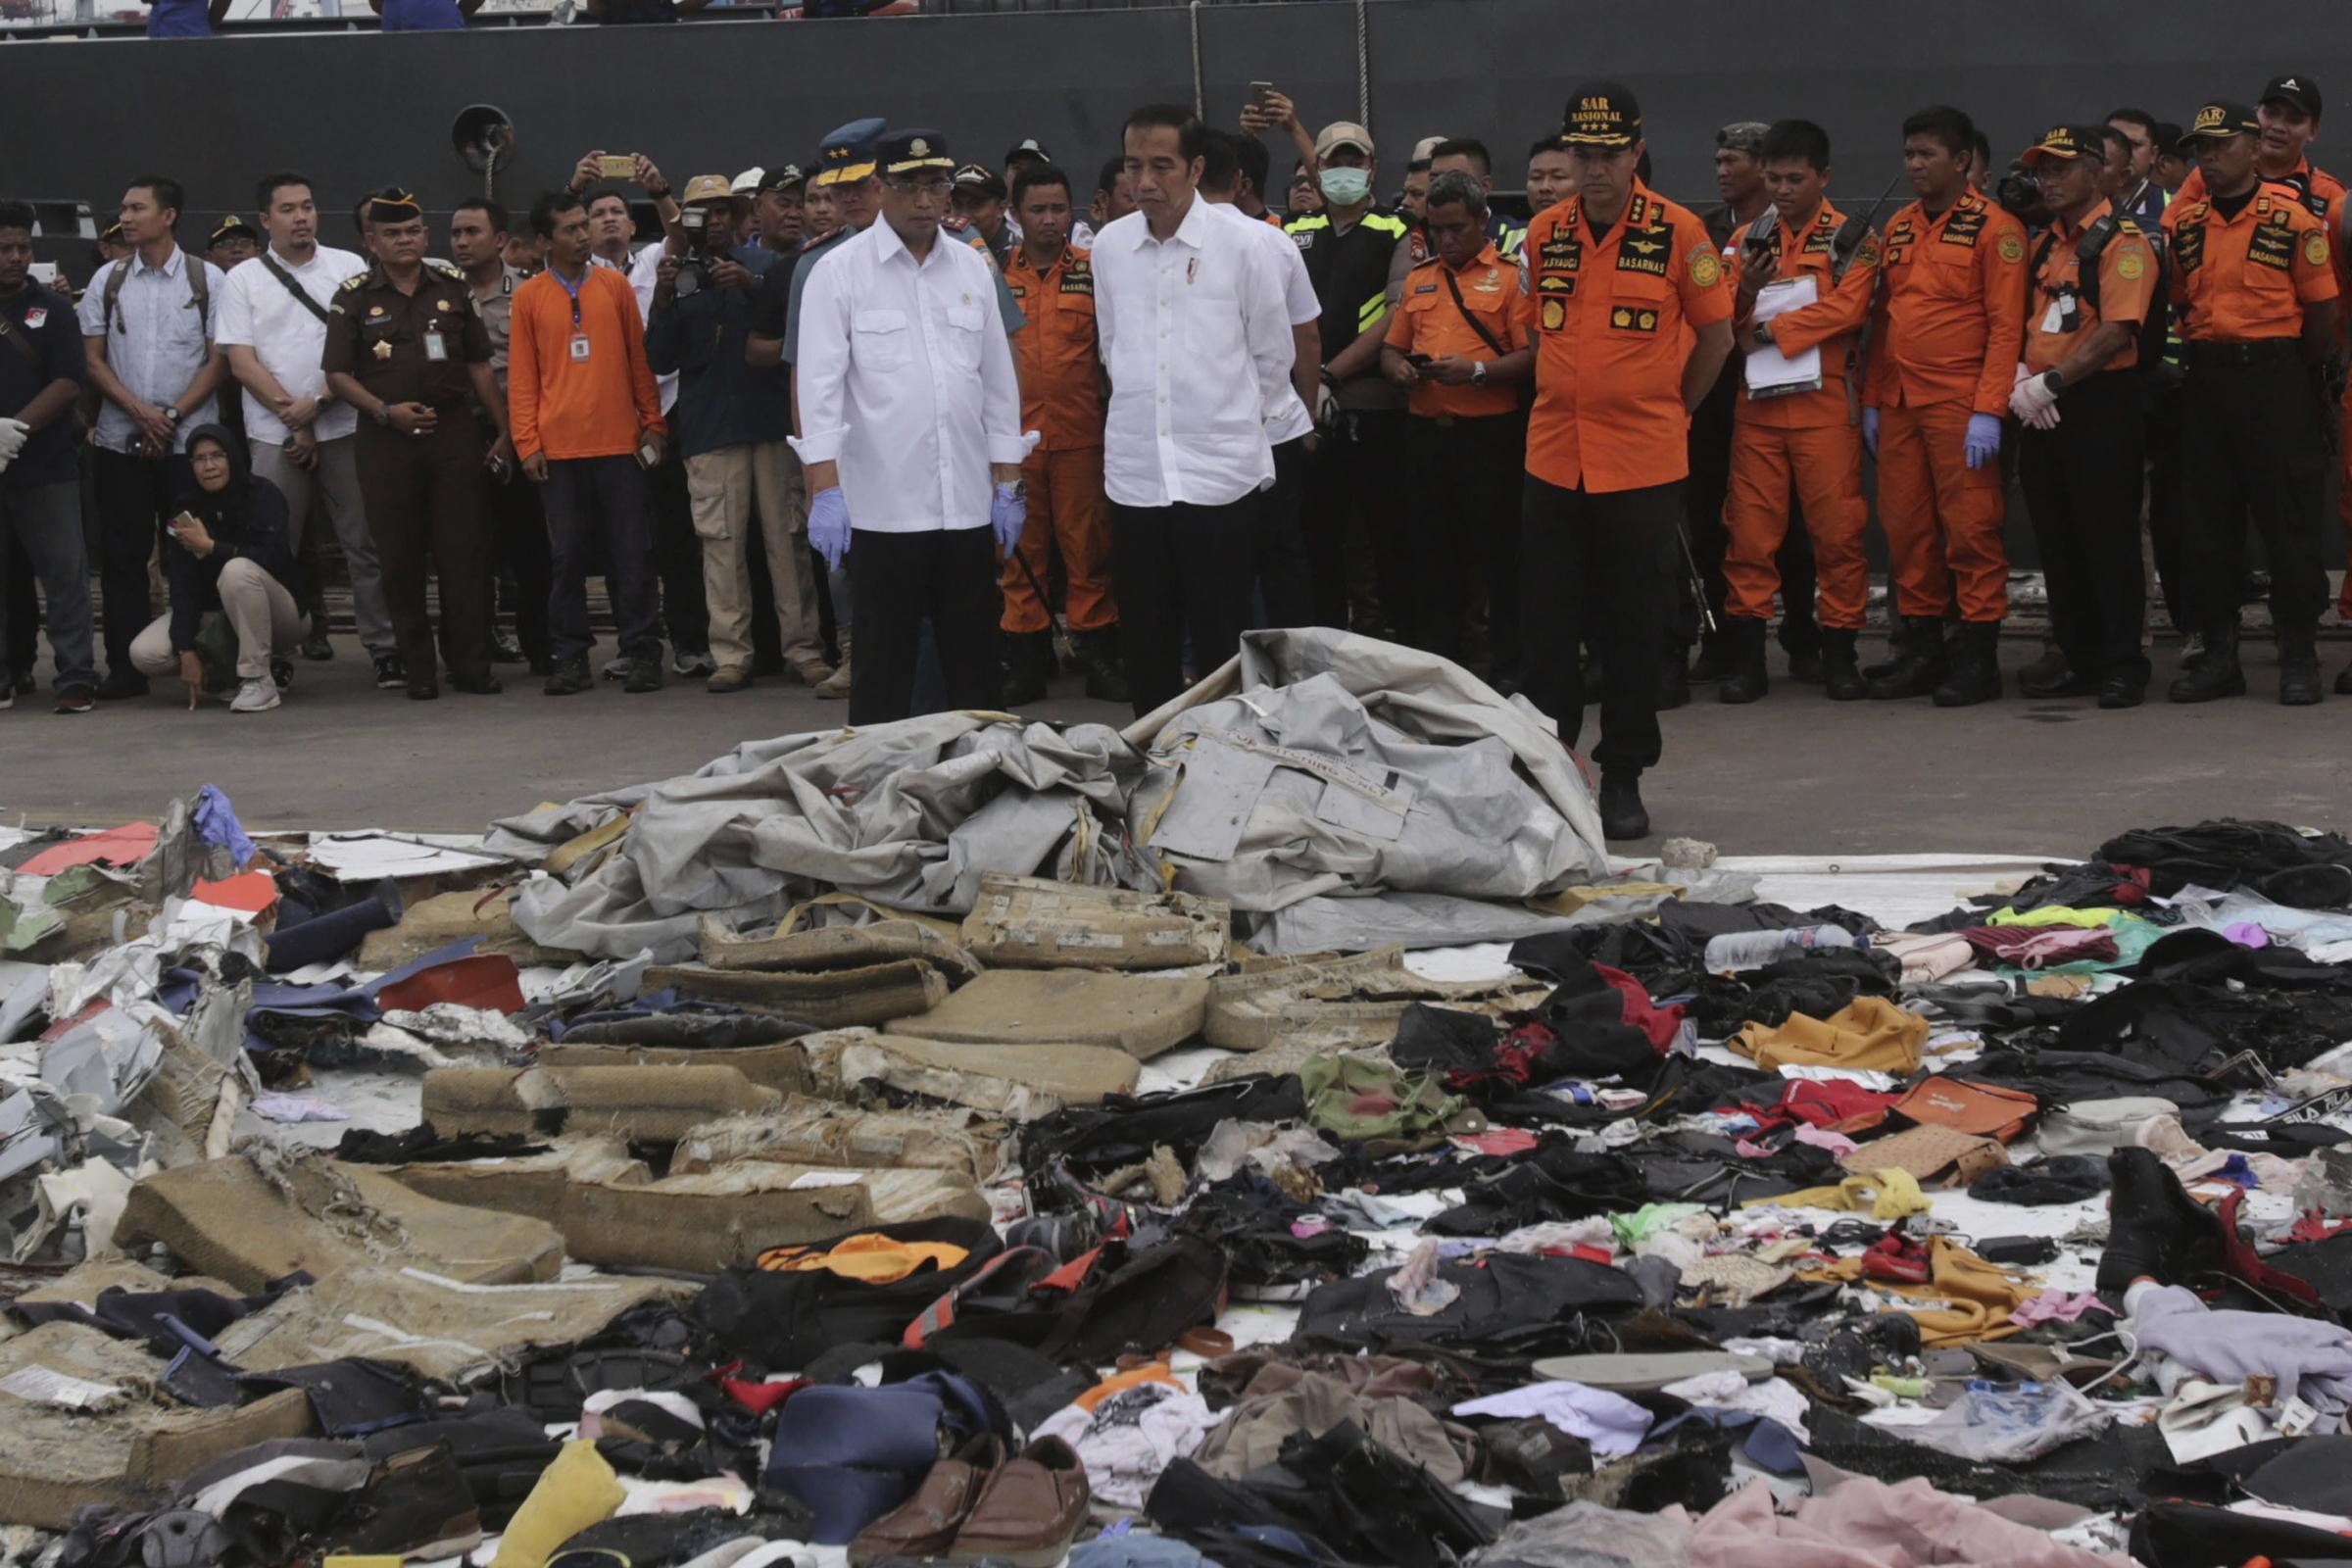 Queen sends condolences to Indonesia following plane disaster